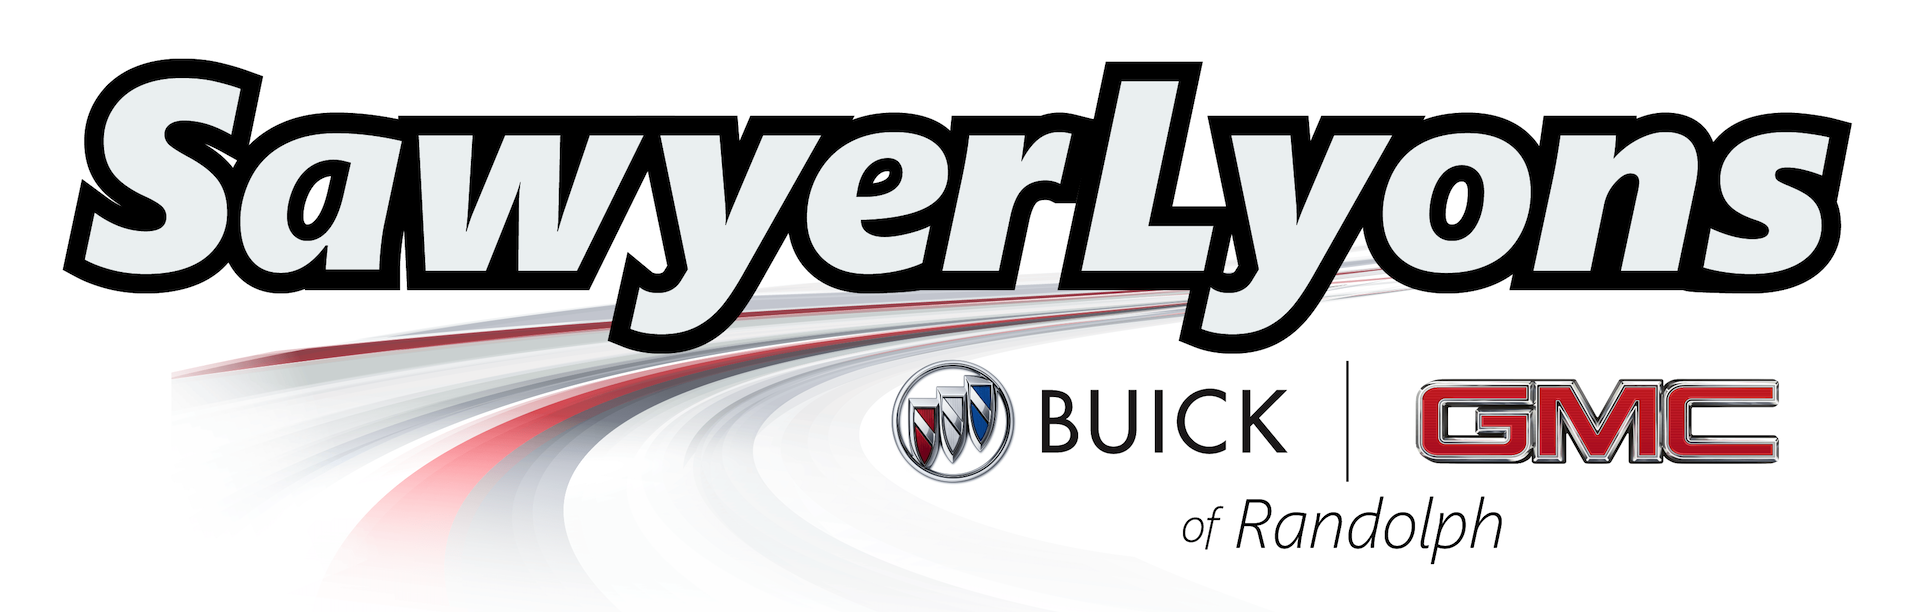 Sawyer Lyons logo